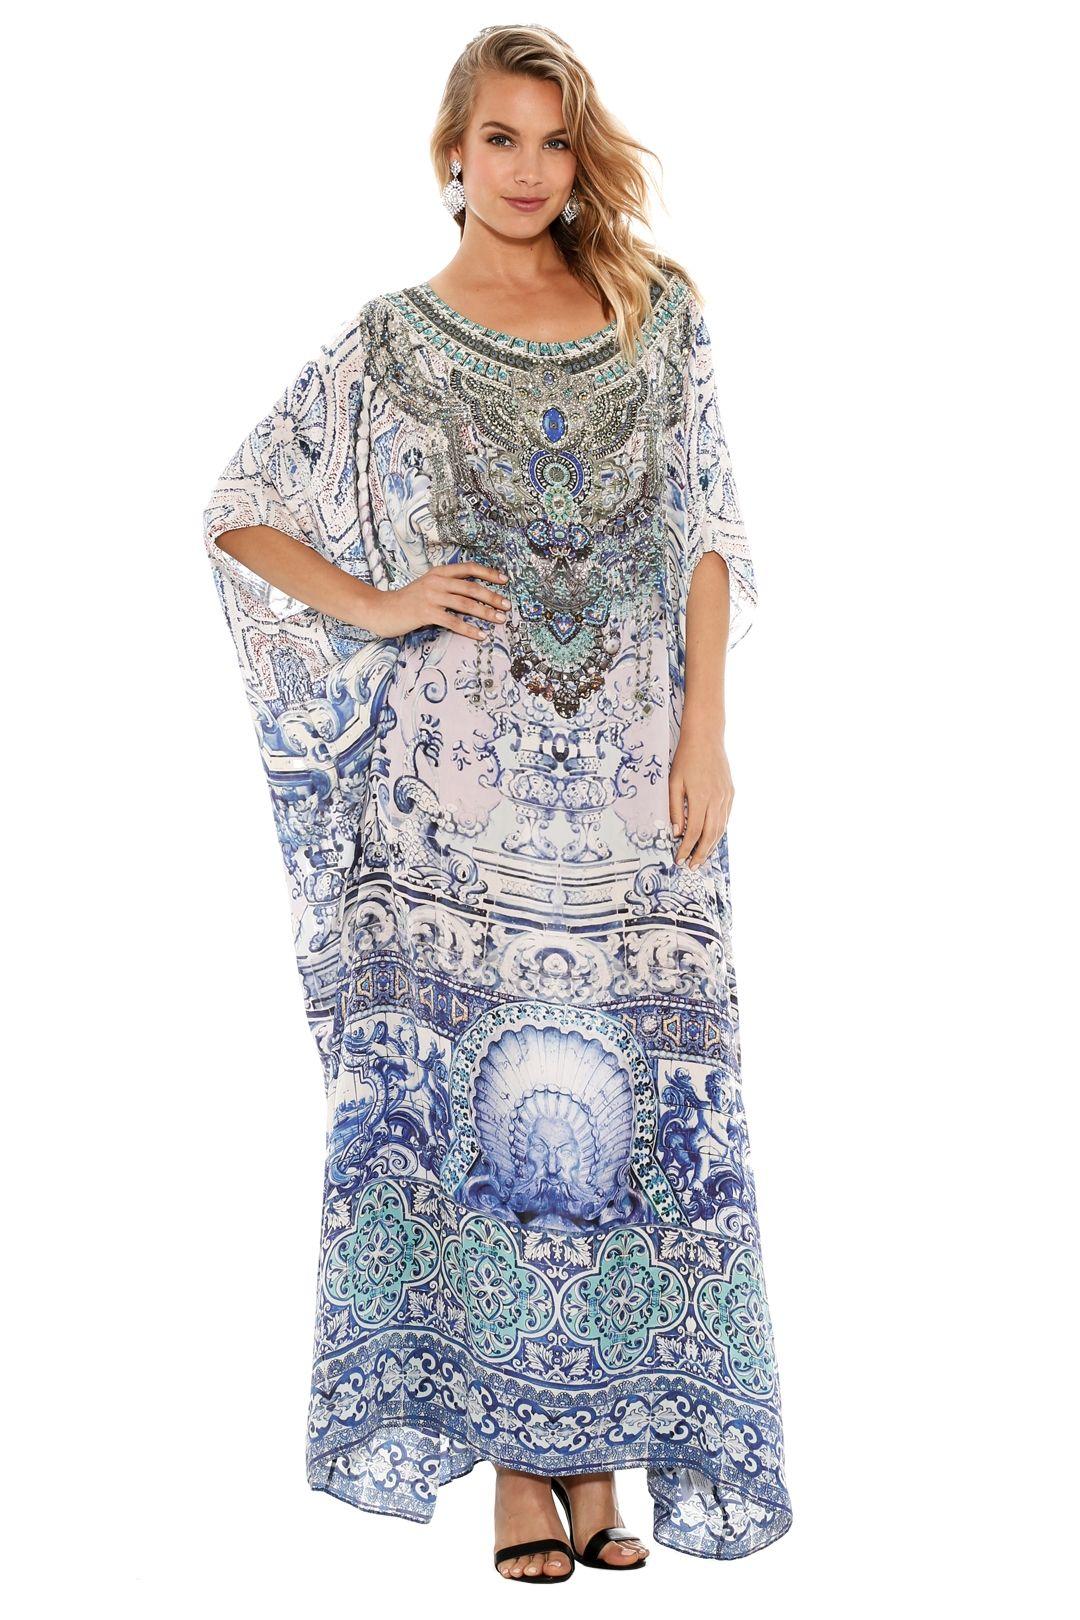 Camilla - Temptress of the Deep Round Neck Kaftan - Prints - Front